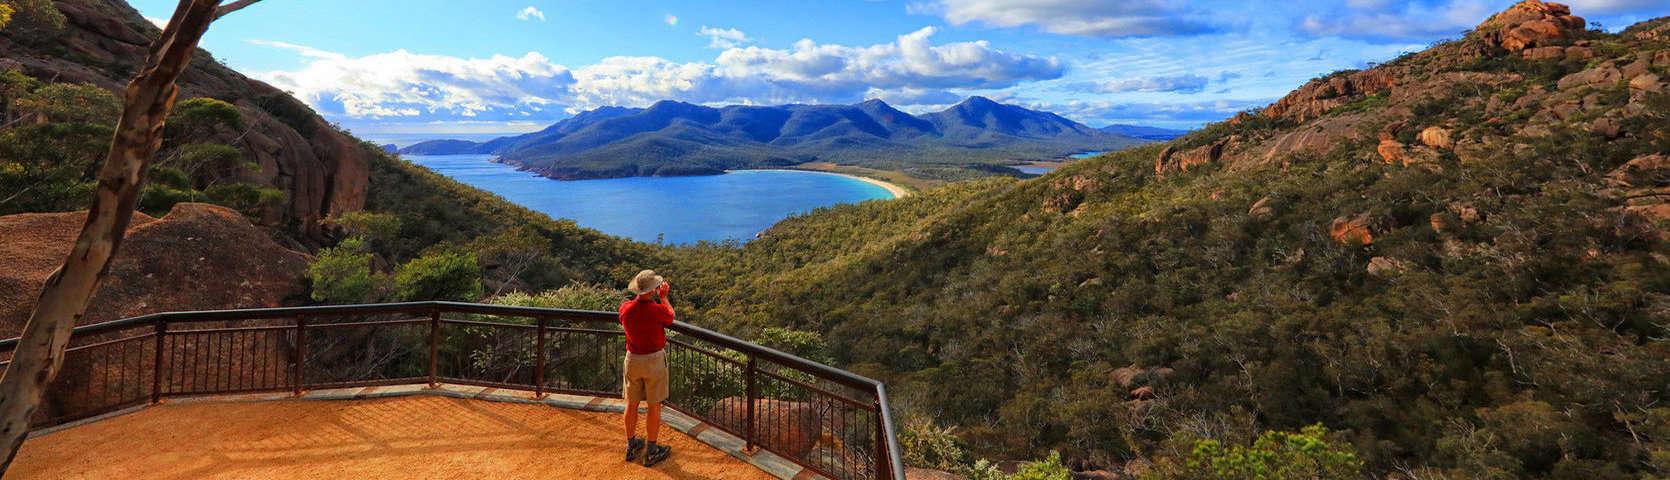 Wineglass Bay Lookout, Tasmania